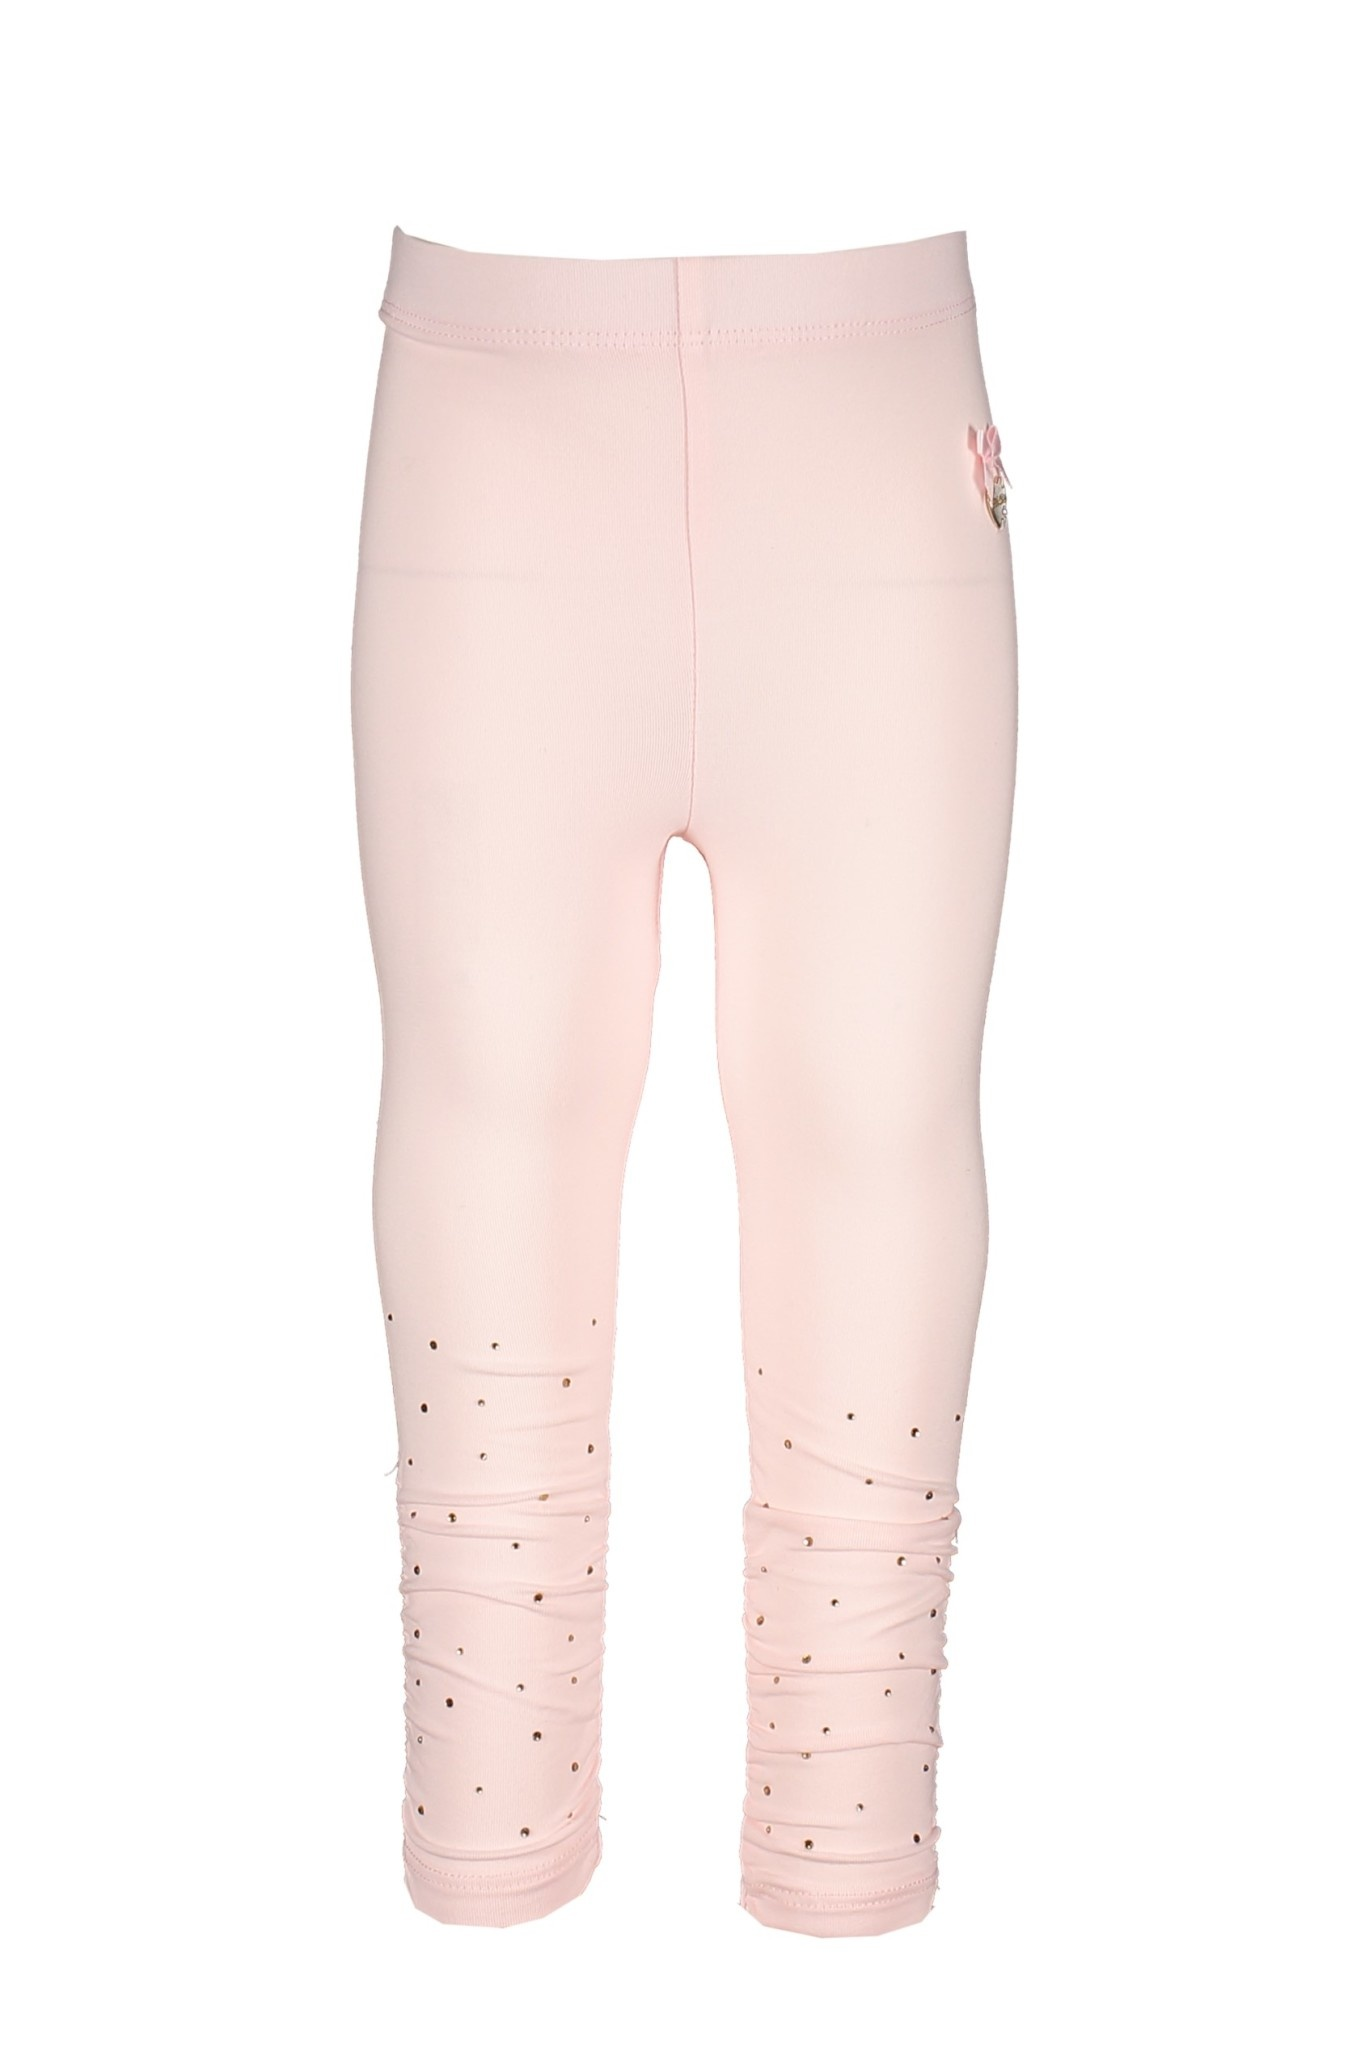 Lechic Lechic Pink Glitter Legging